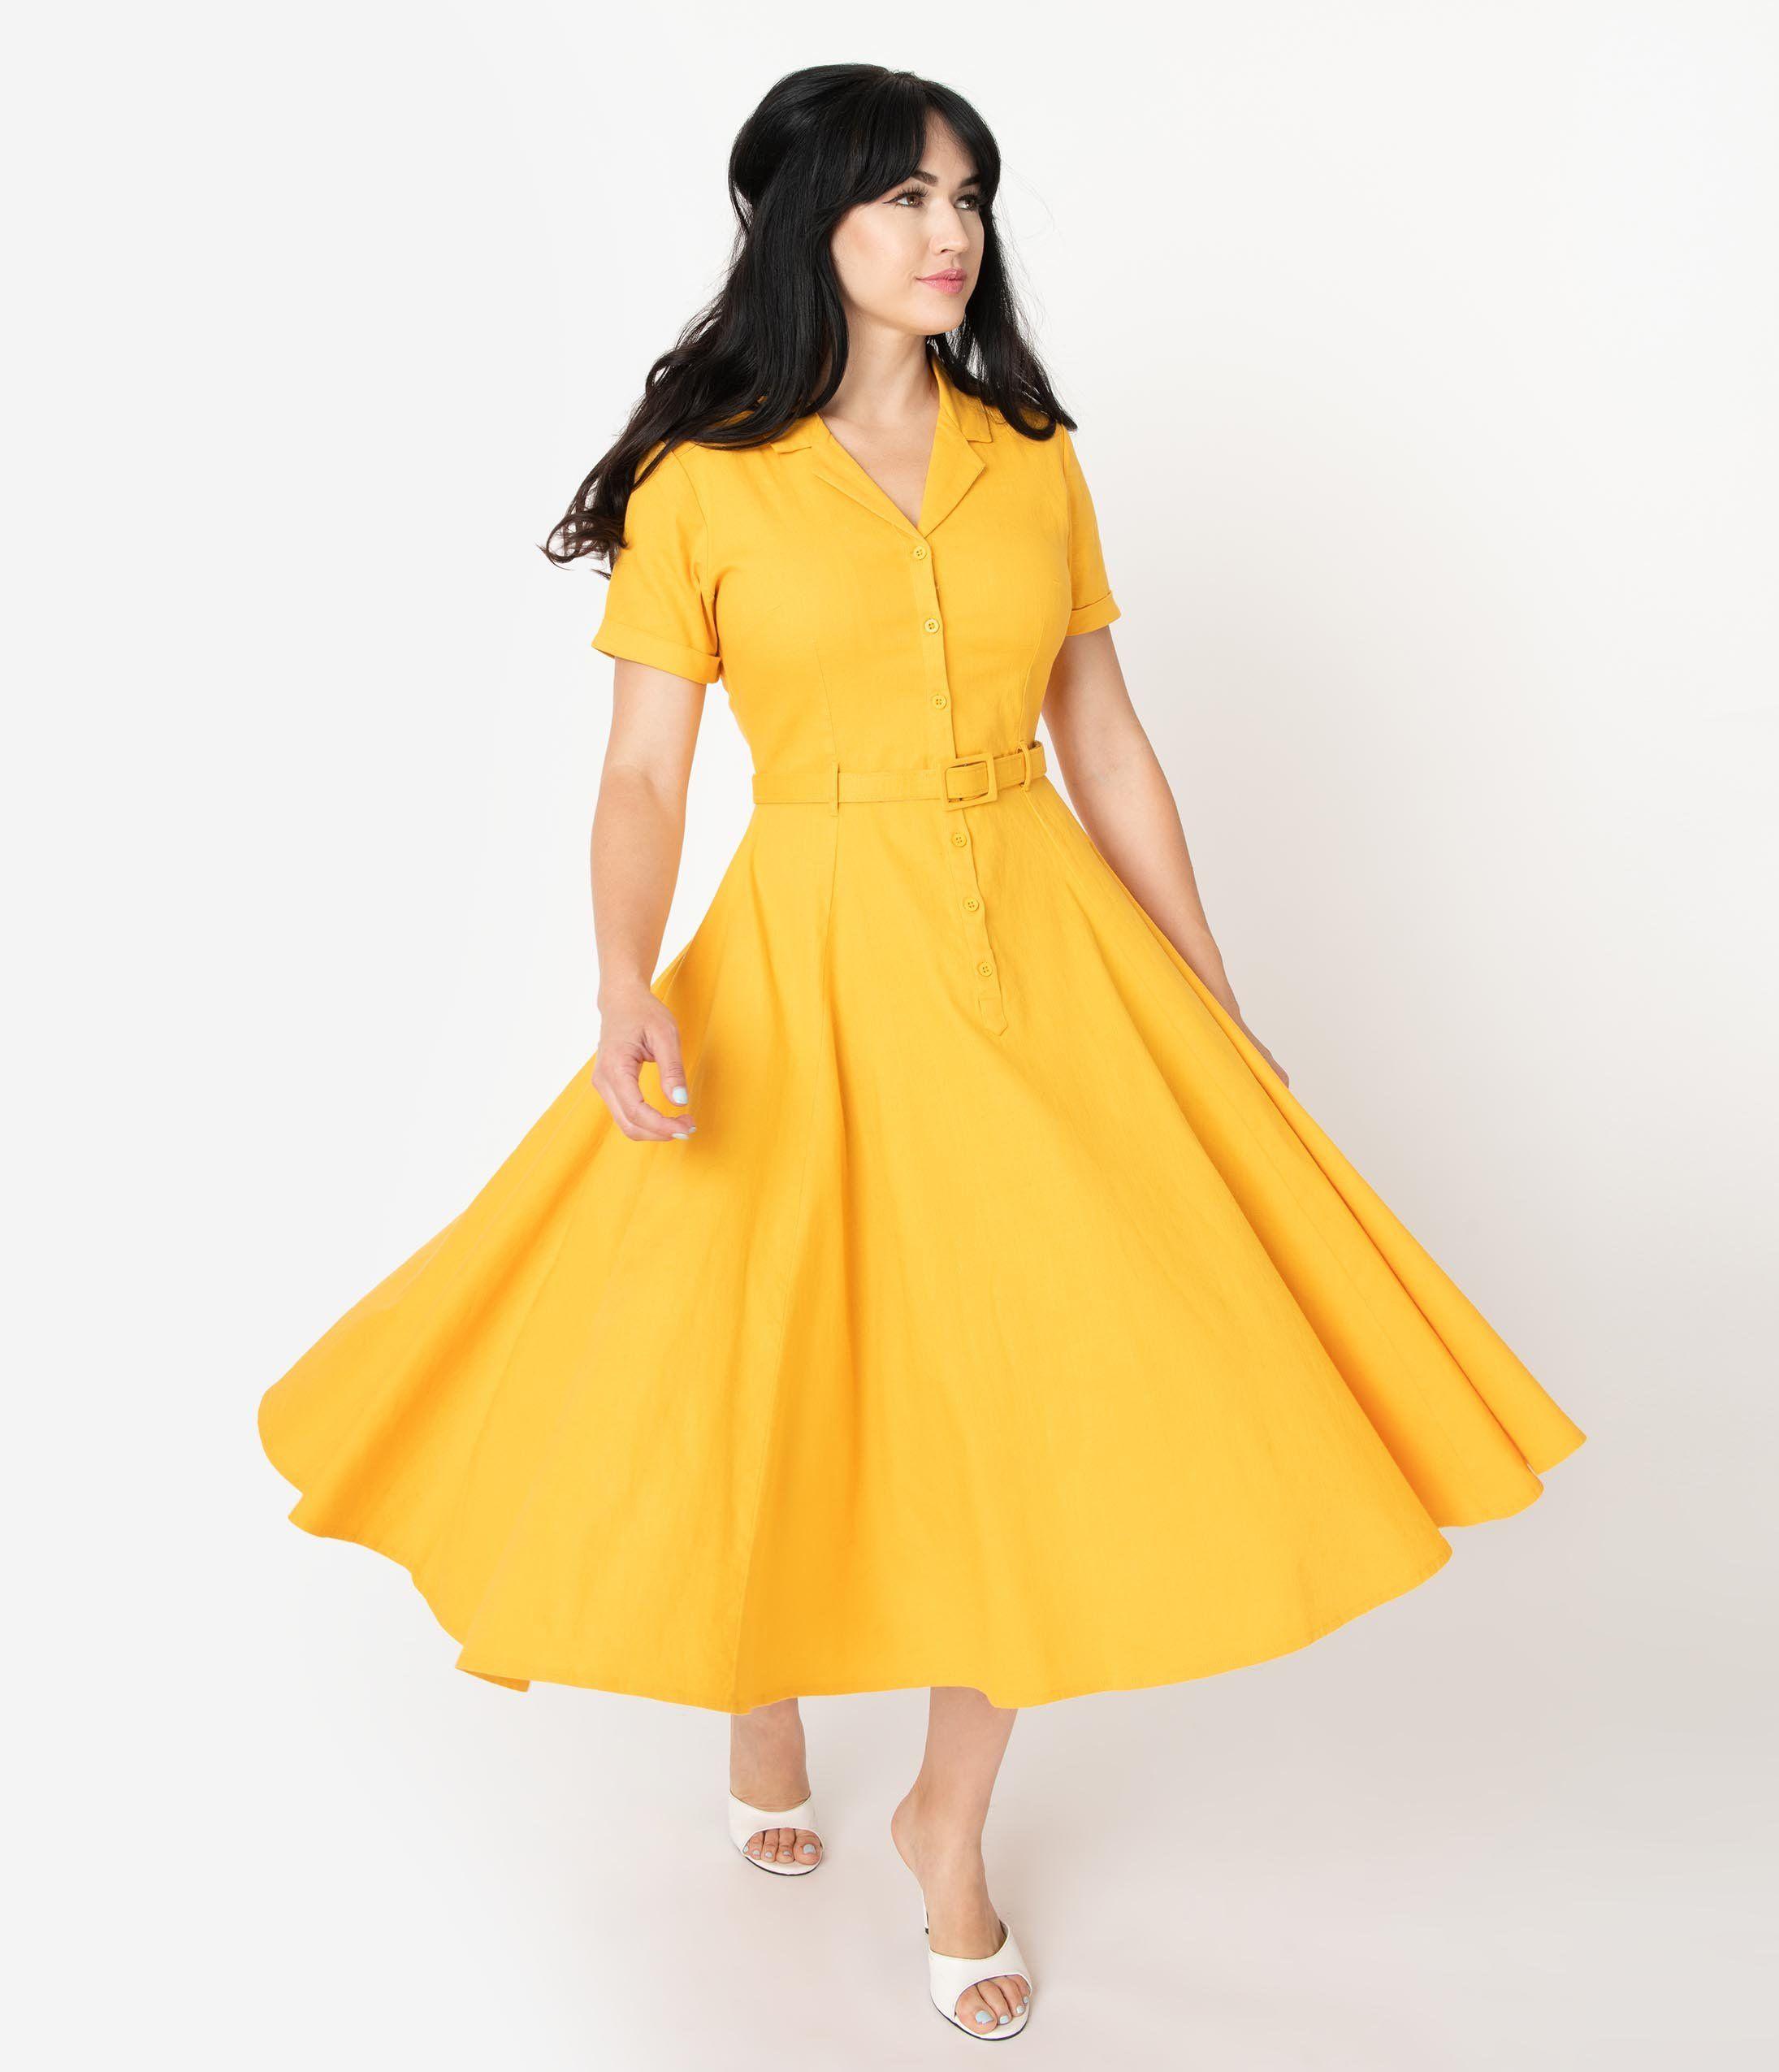 1950s Swing Dresses 50s Swing Dress Yellow Vintage Dress Yellow Swing Dress 1950s Swing Dress [ 2550 x 2190 Pixel ]